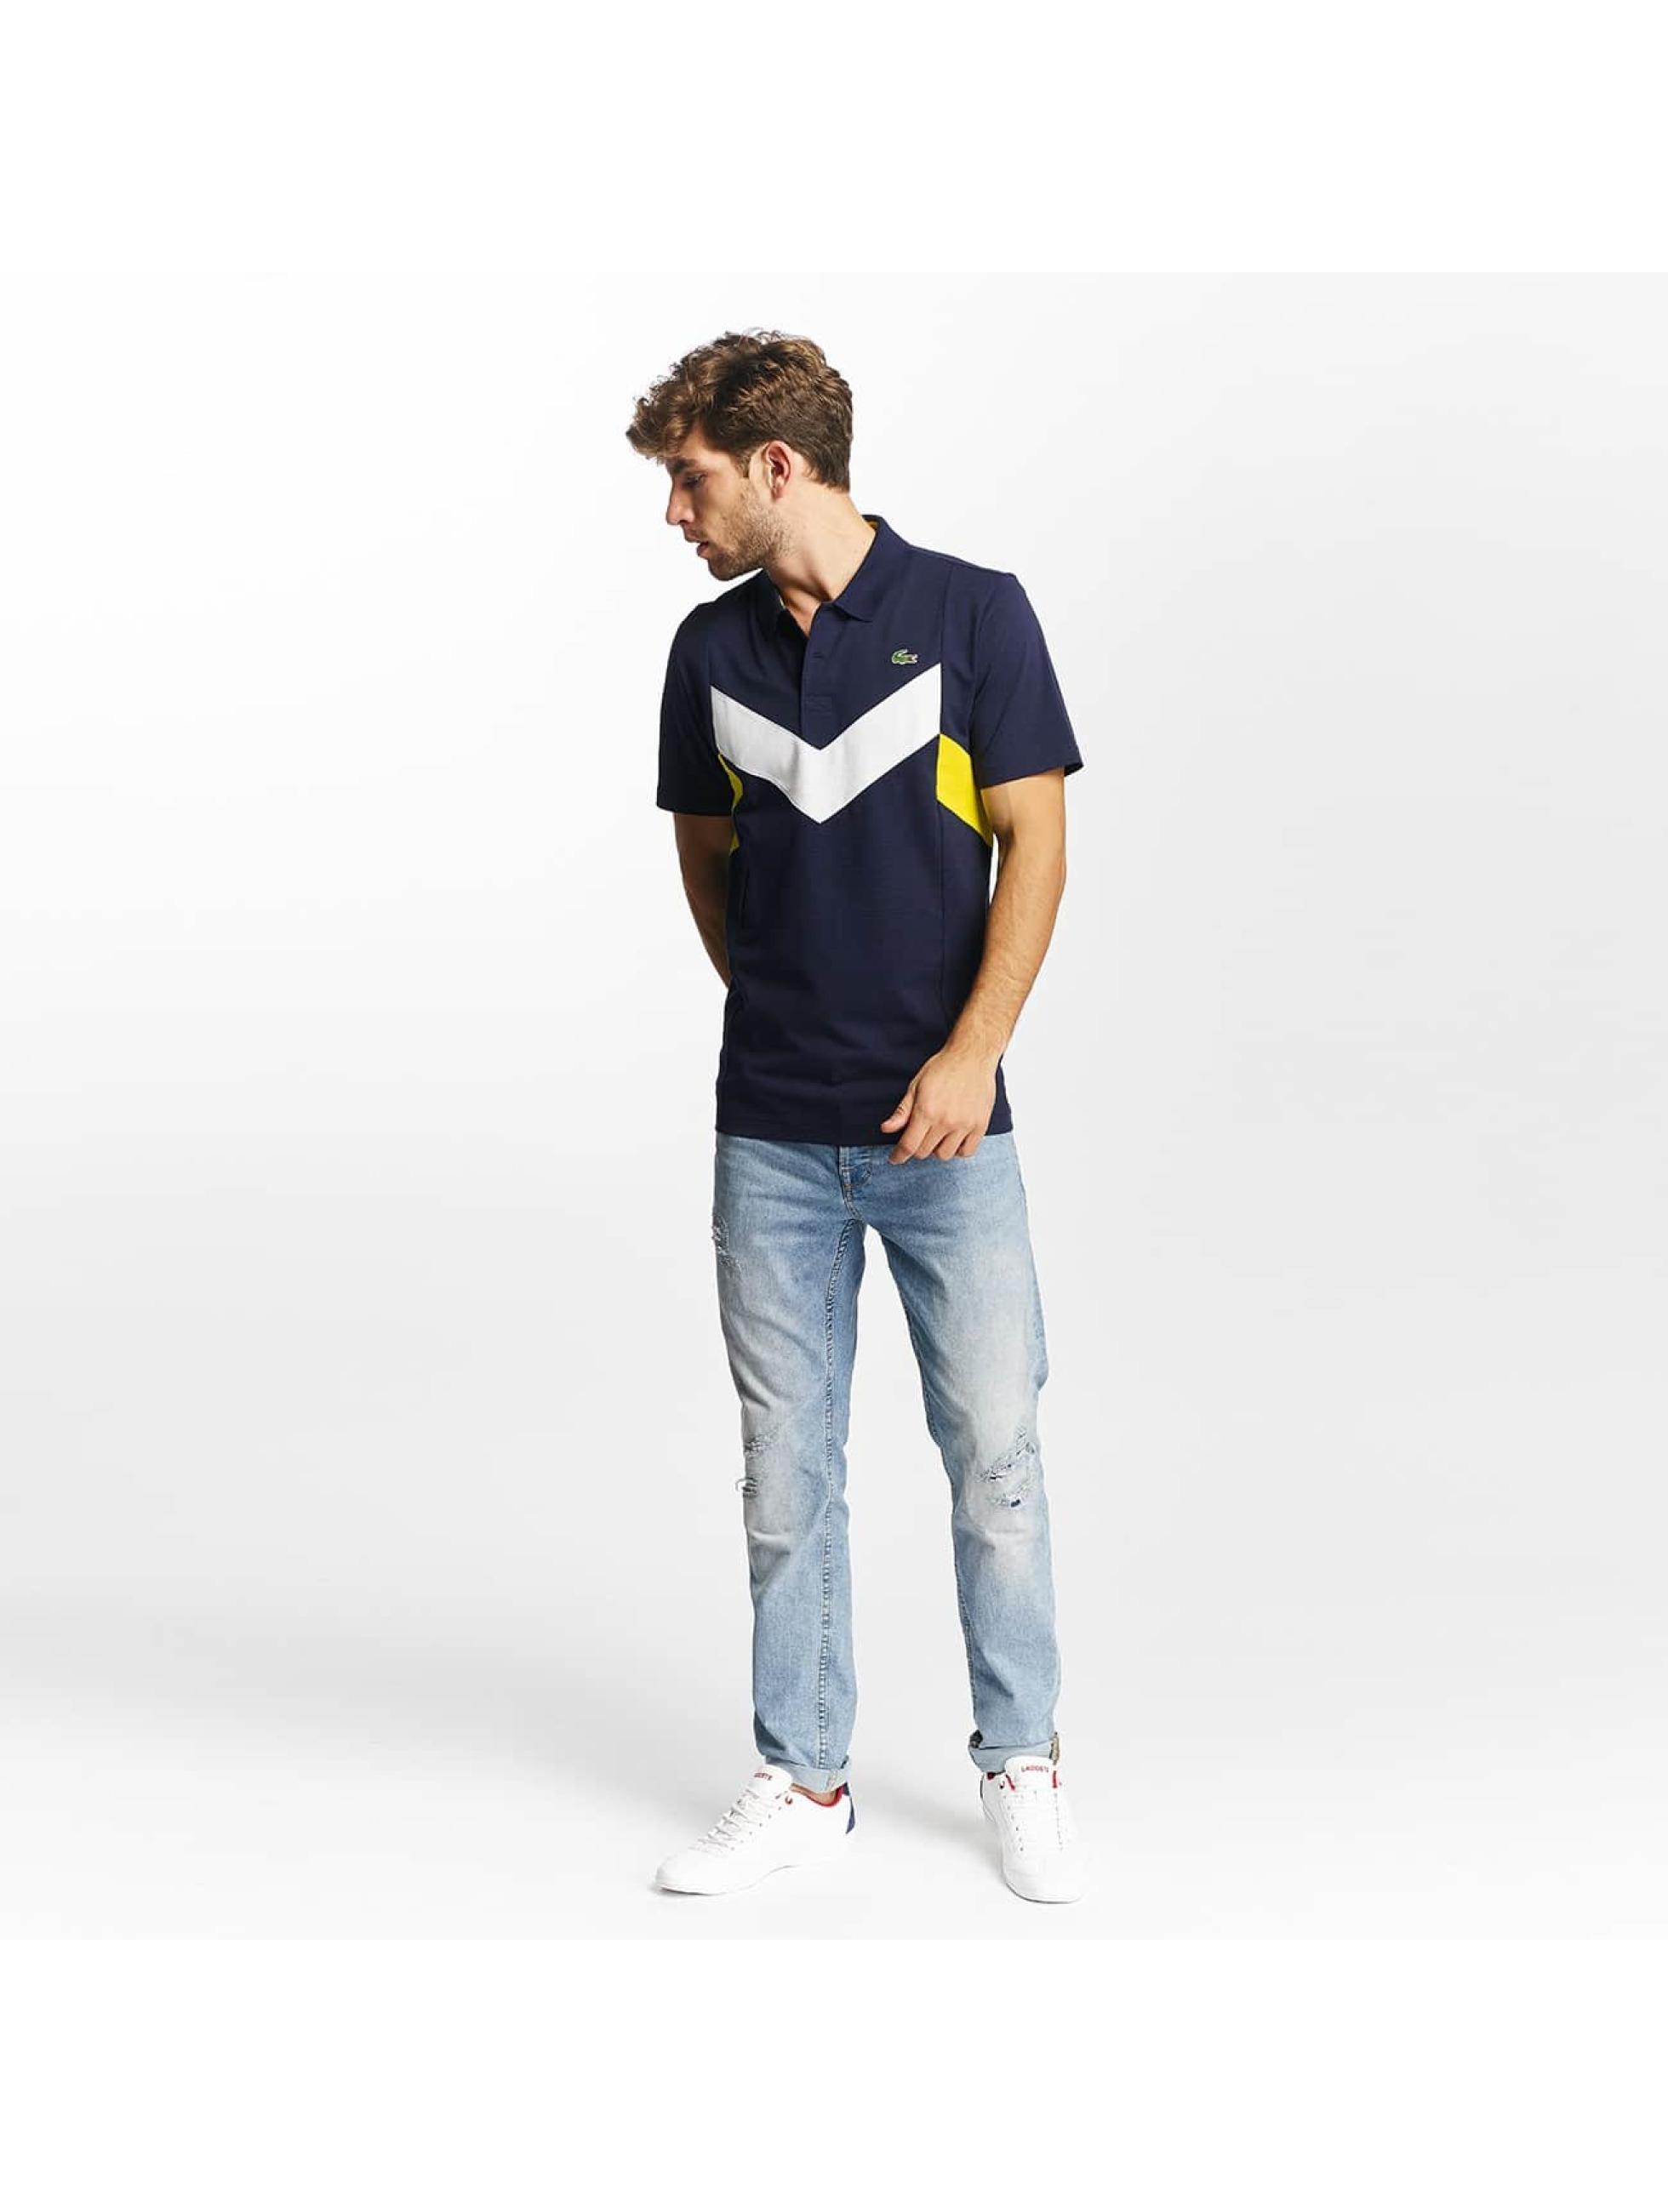 Lacoste Classic Koszulki Polo SHort Sleeved Ribbed Collar kolorowy